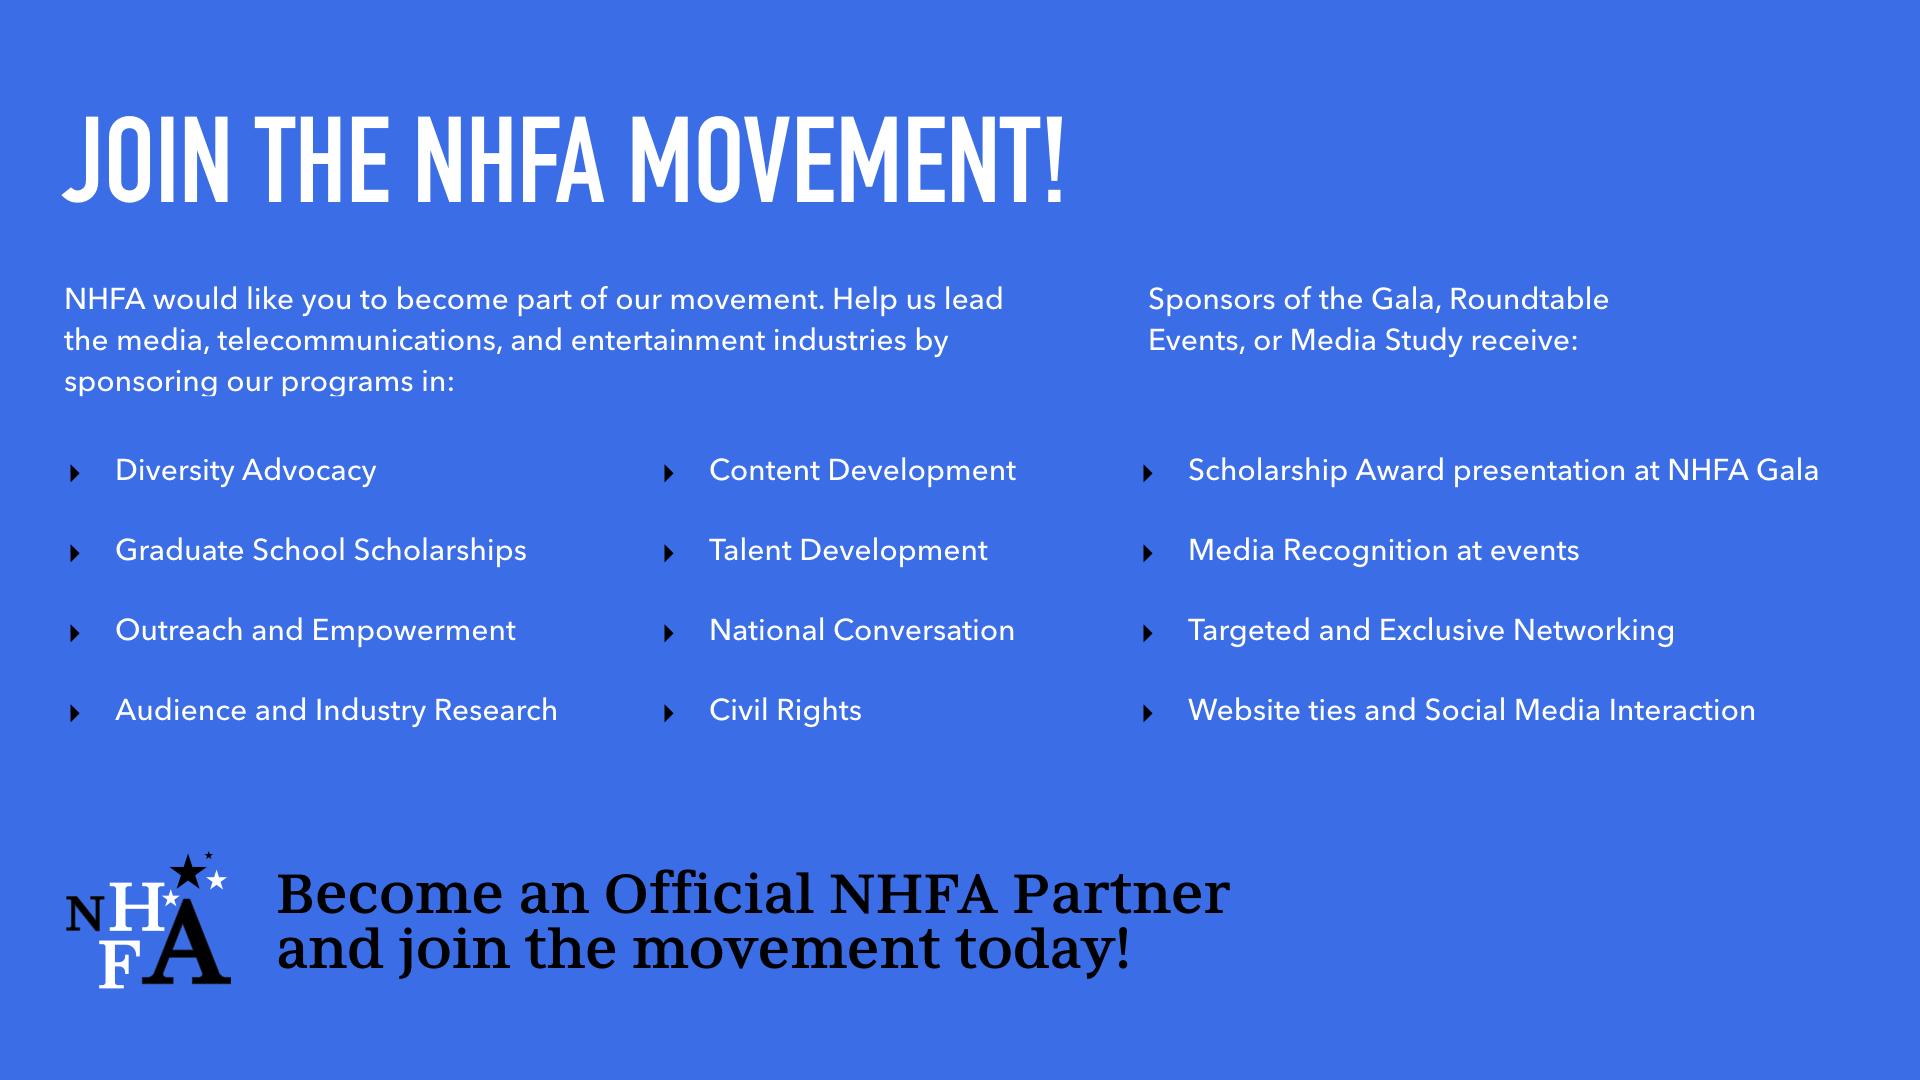 nhfa-synopsis-generic 2019.021.jpeg